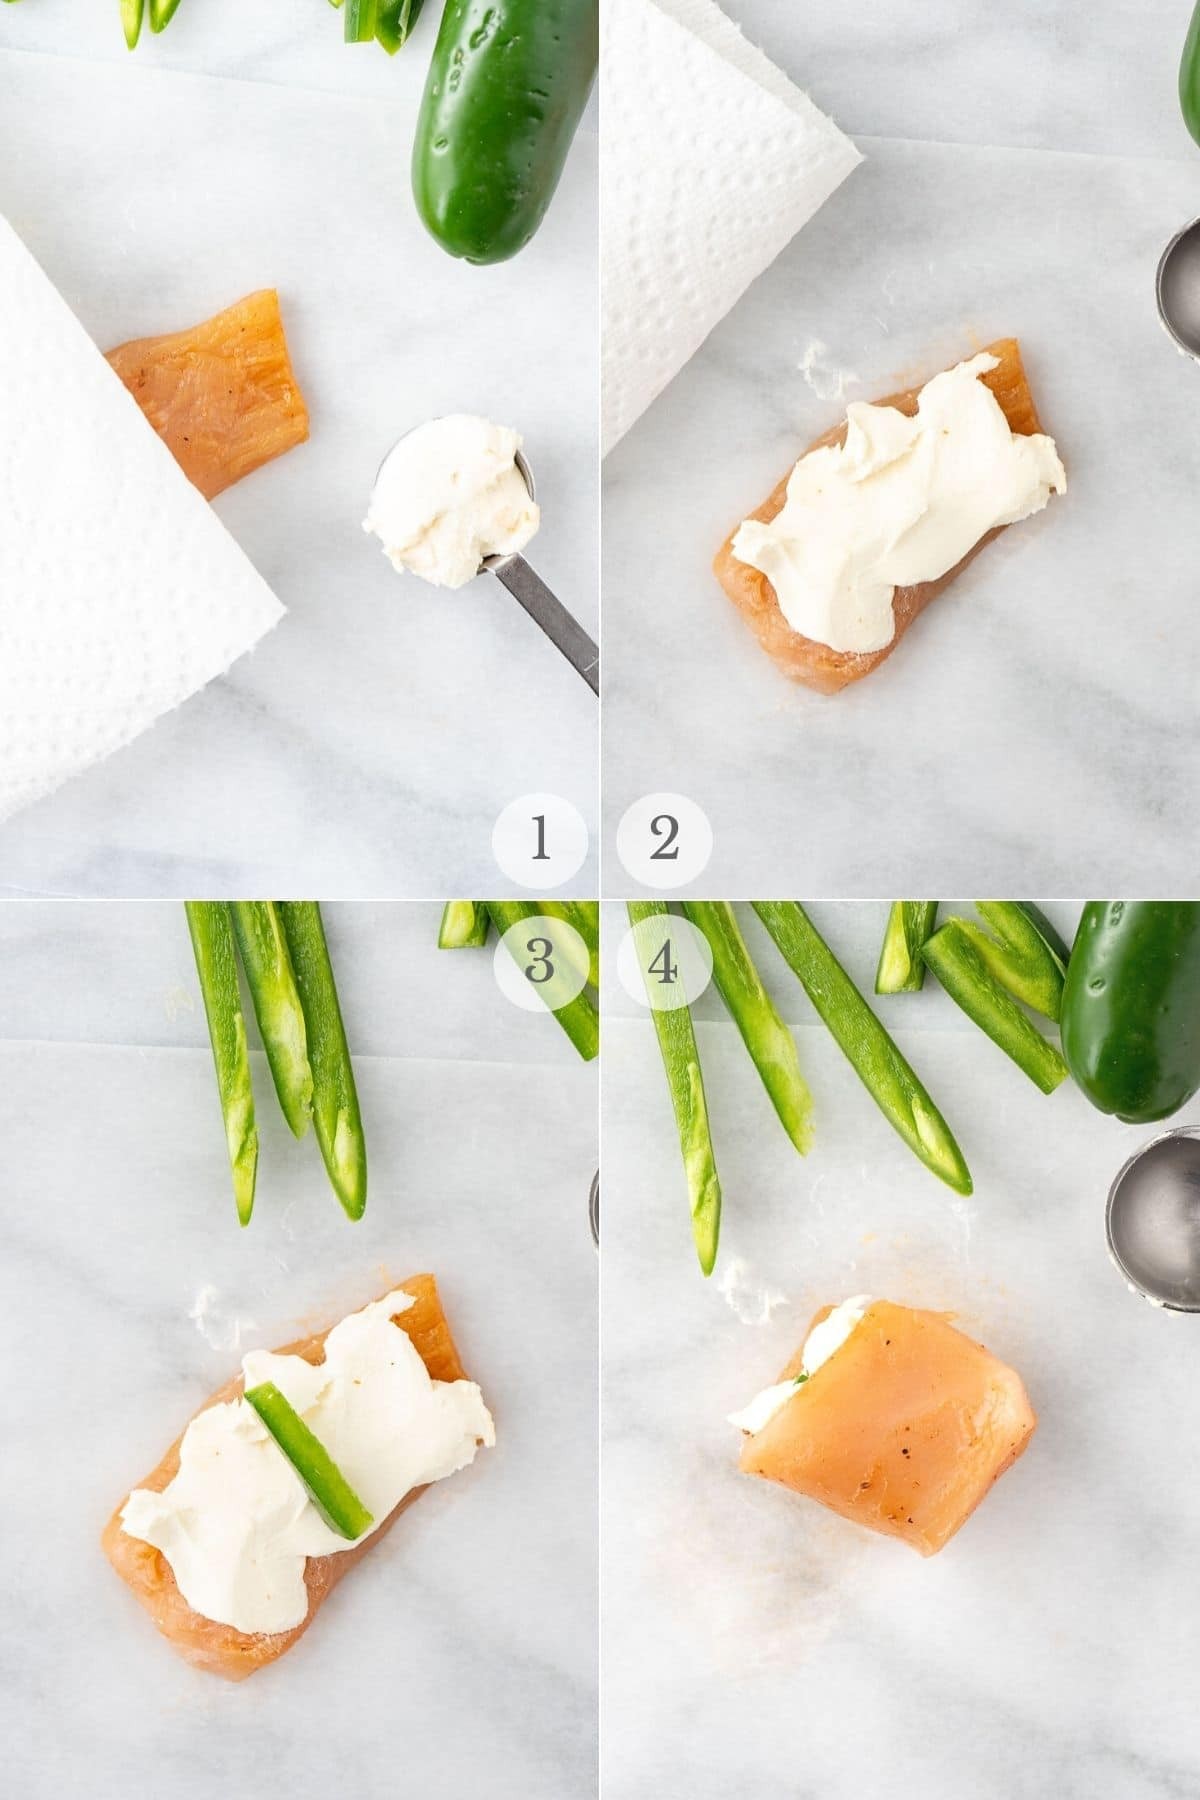 chicken jalapeno poppers recipe steps 1-4